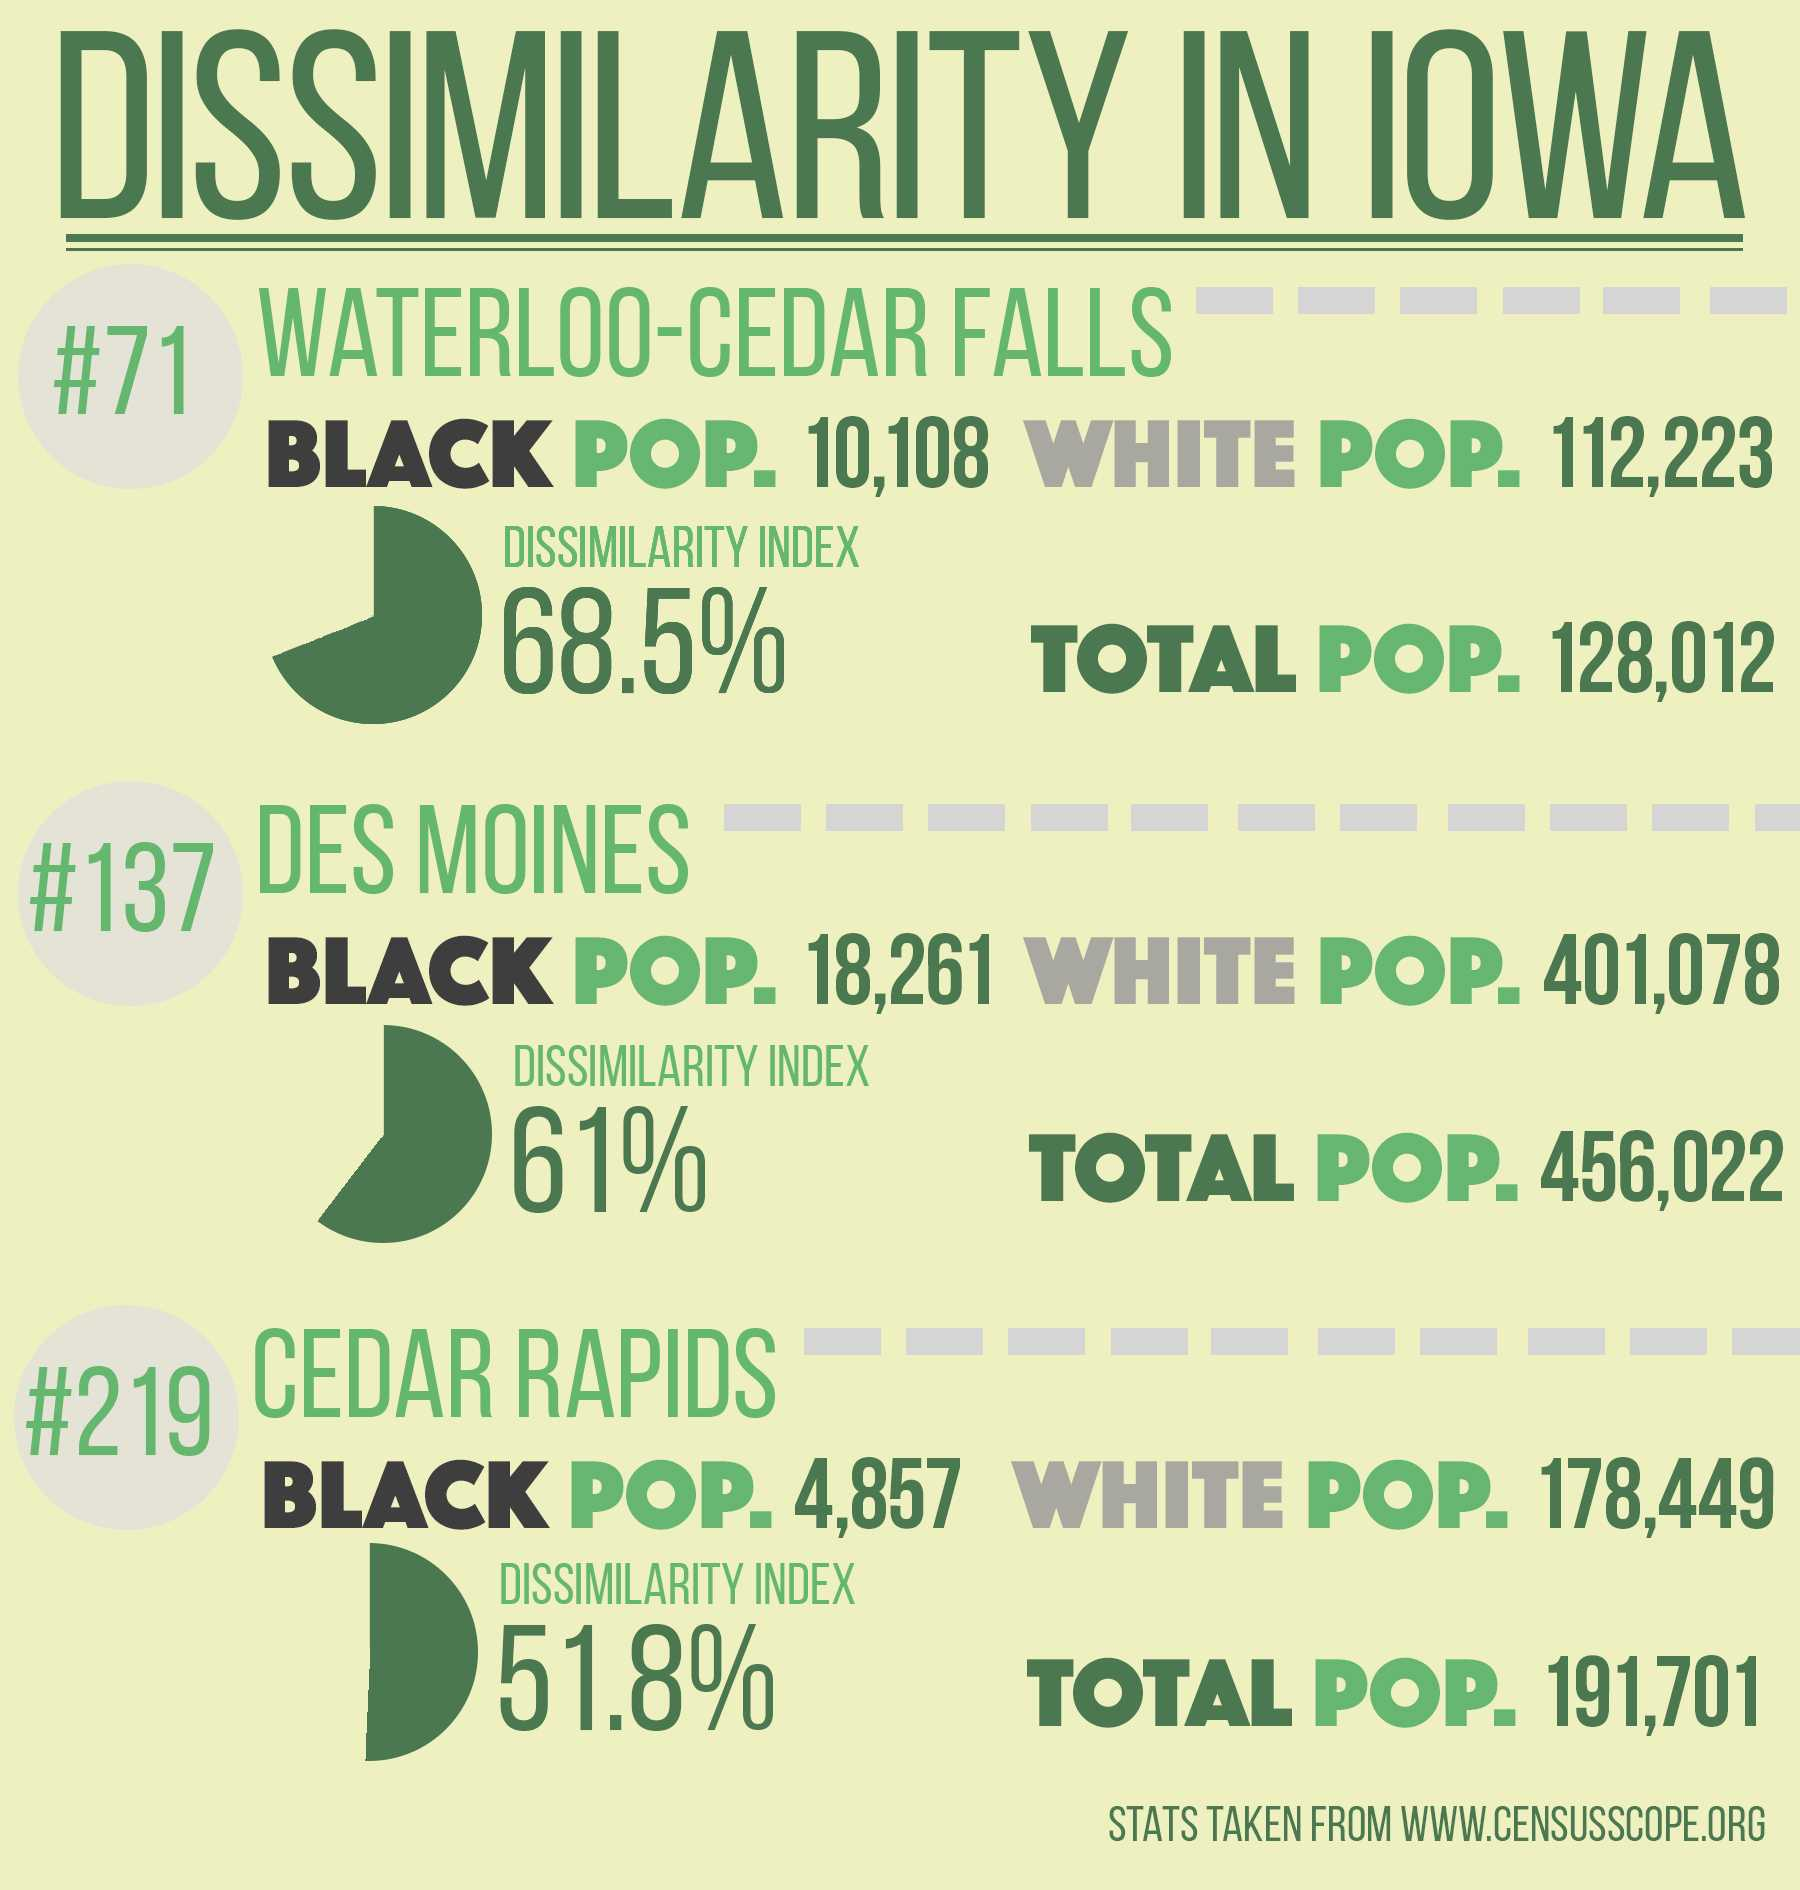 racial hostility plagues cv – northern iowan